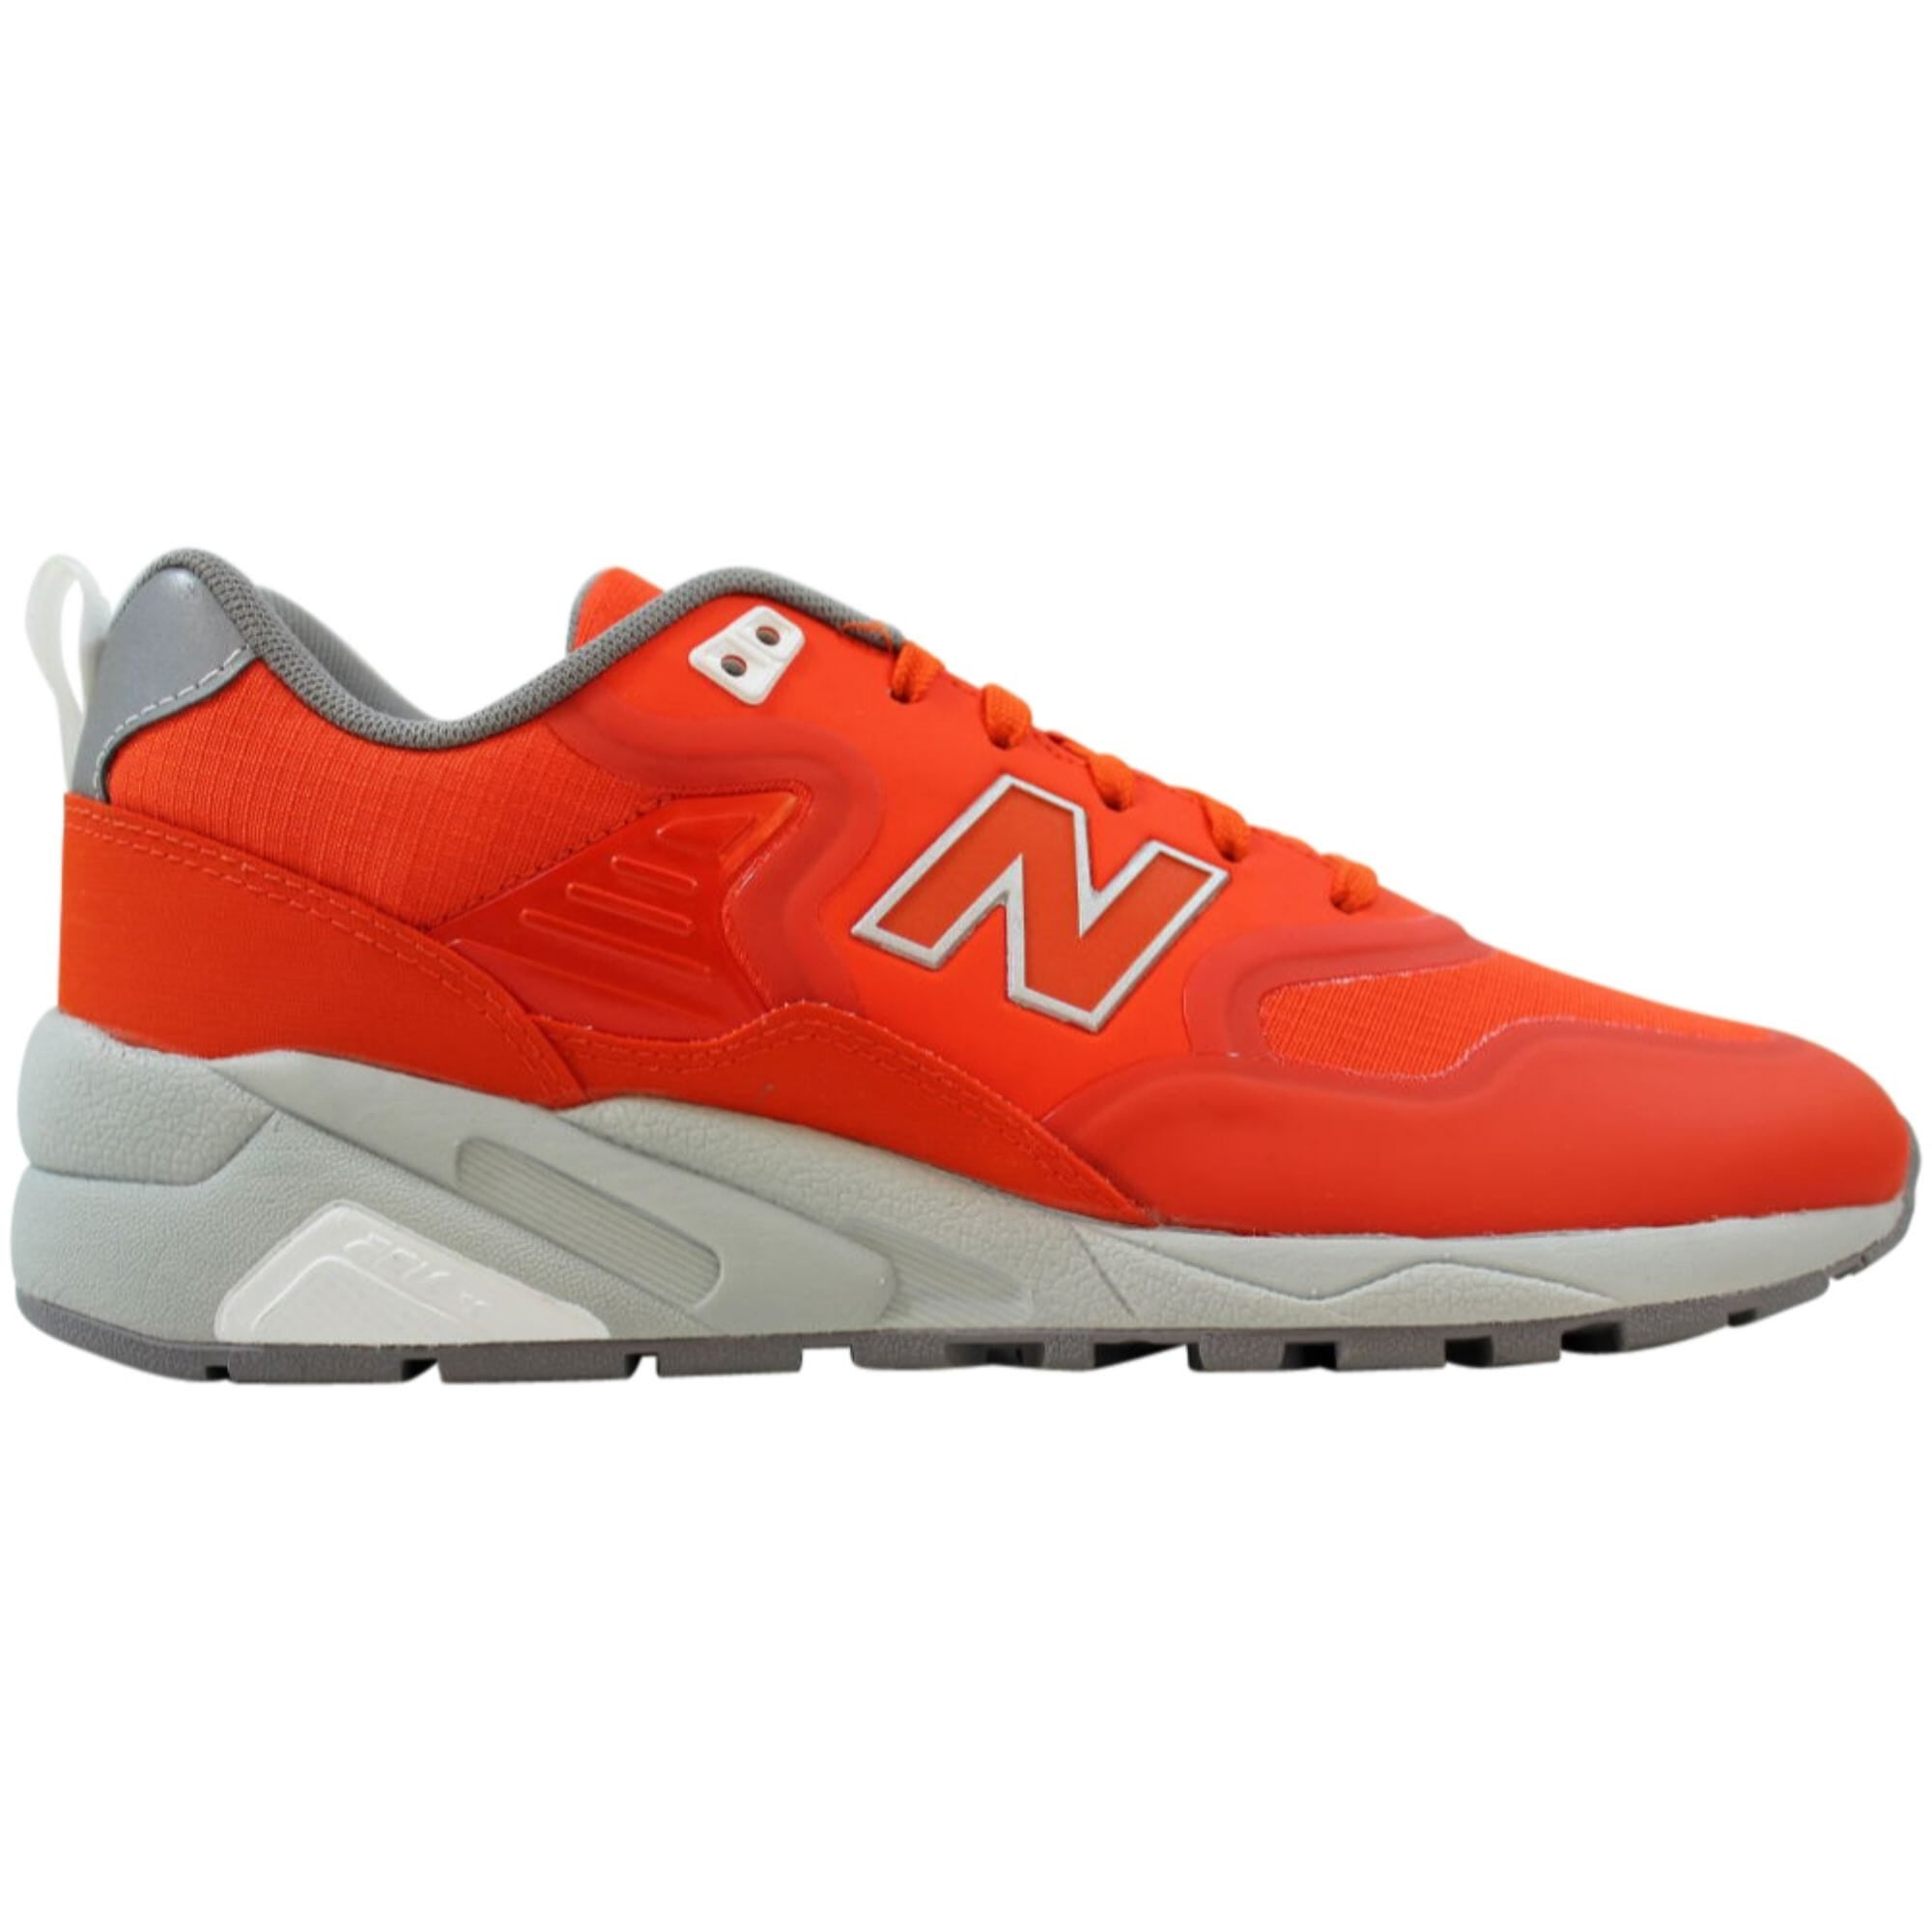 Buy Men's Athletic Shoes Online at Overstock | Our Best Men's ...